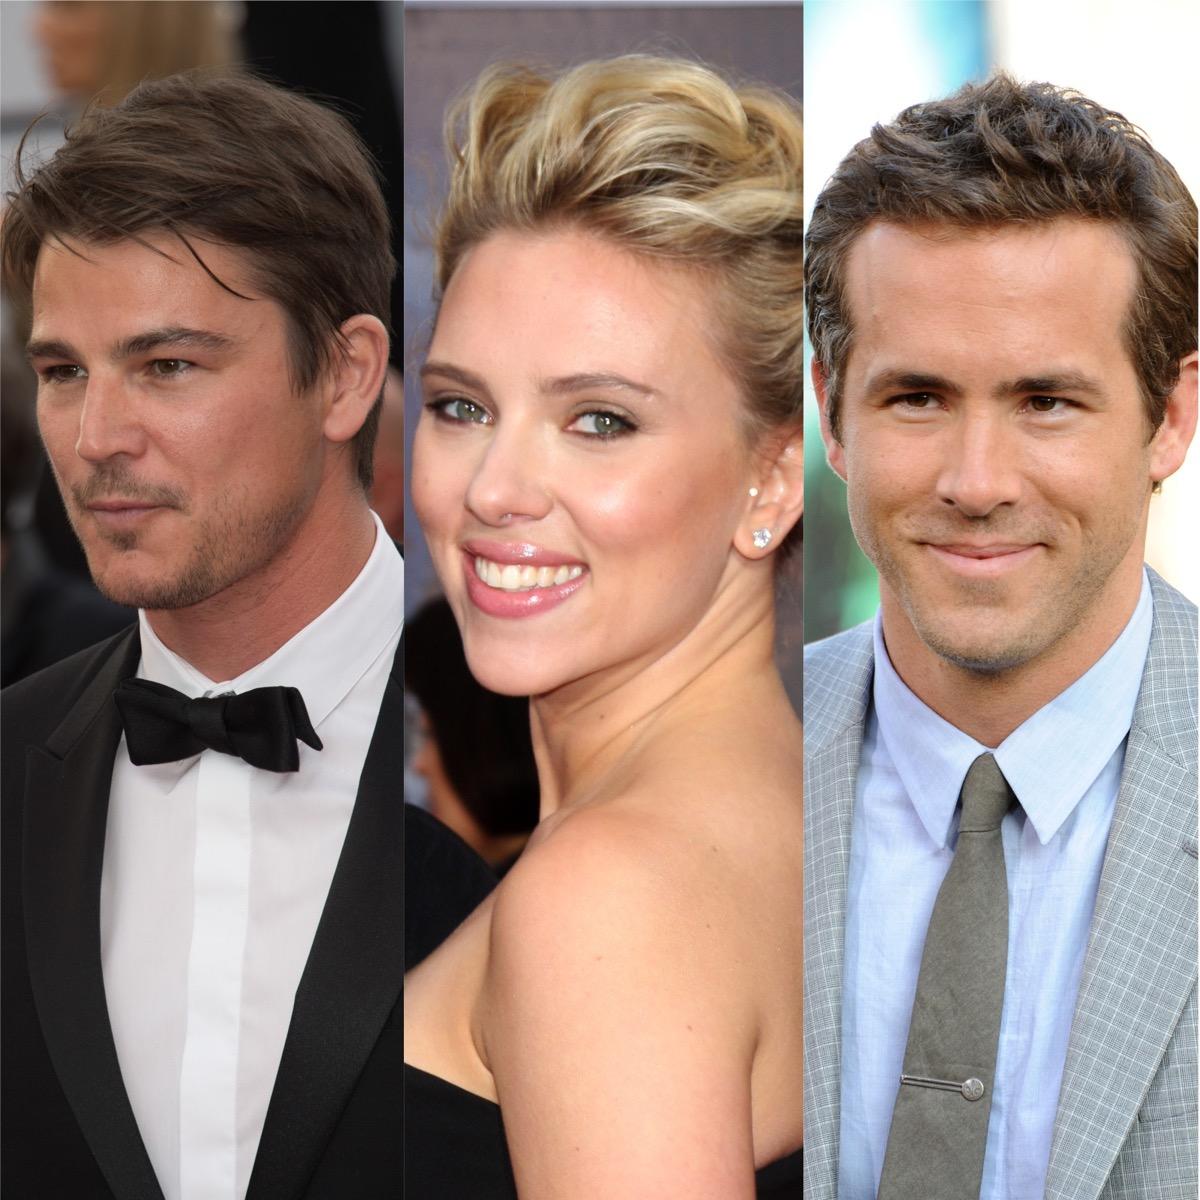 Josh Hartnett, Scarlett Johansson, and Ryan Reynolds